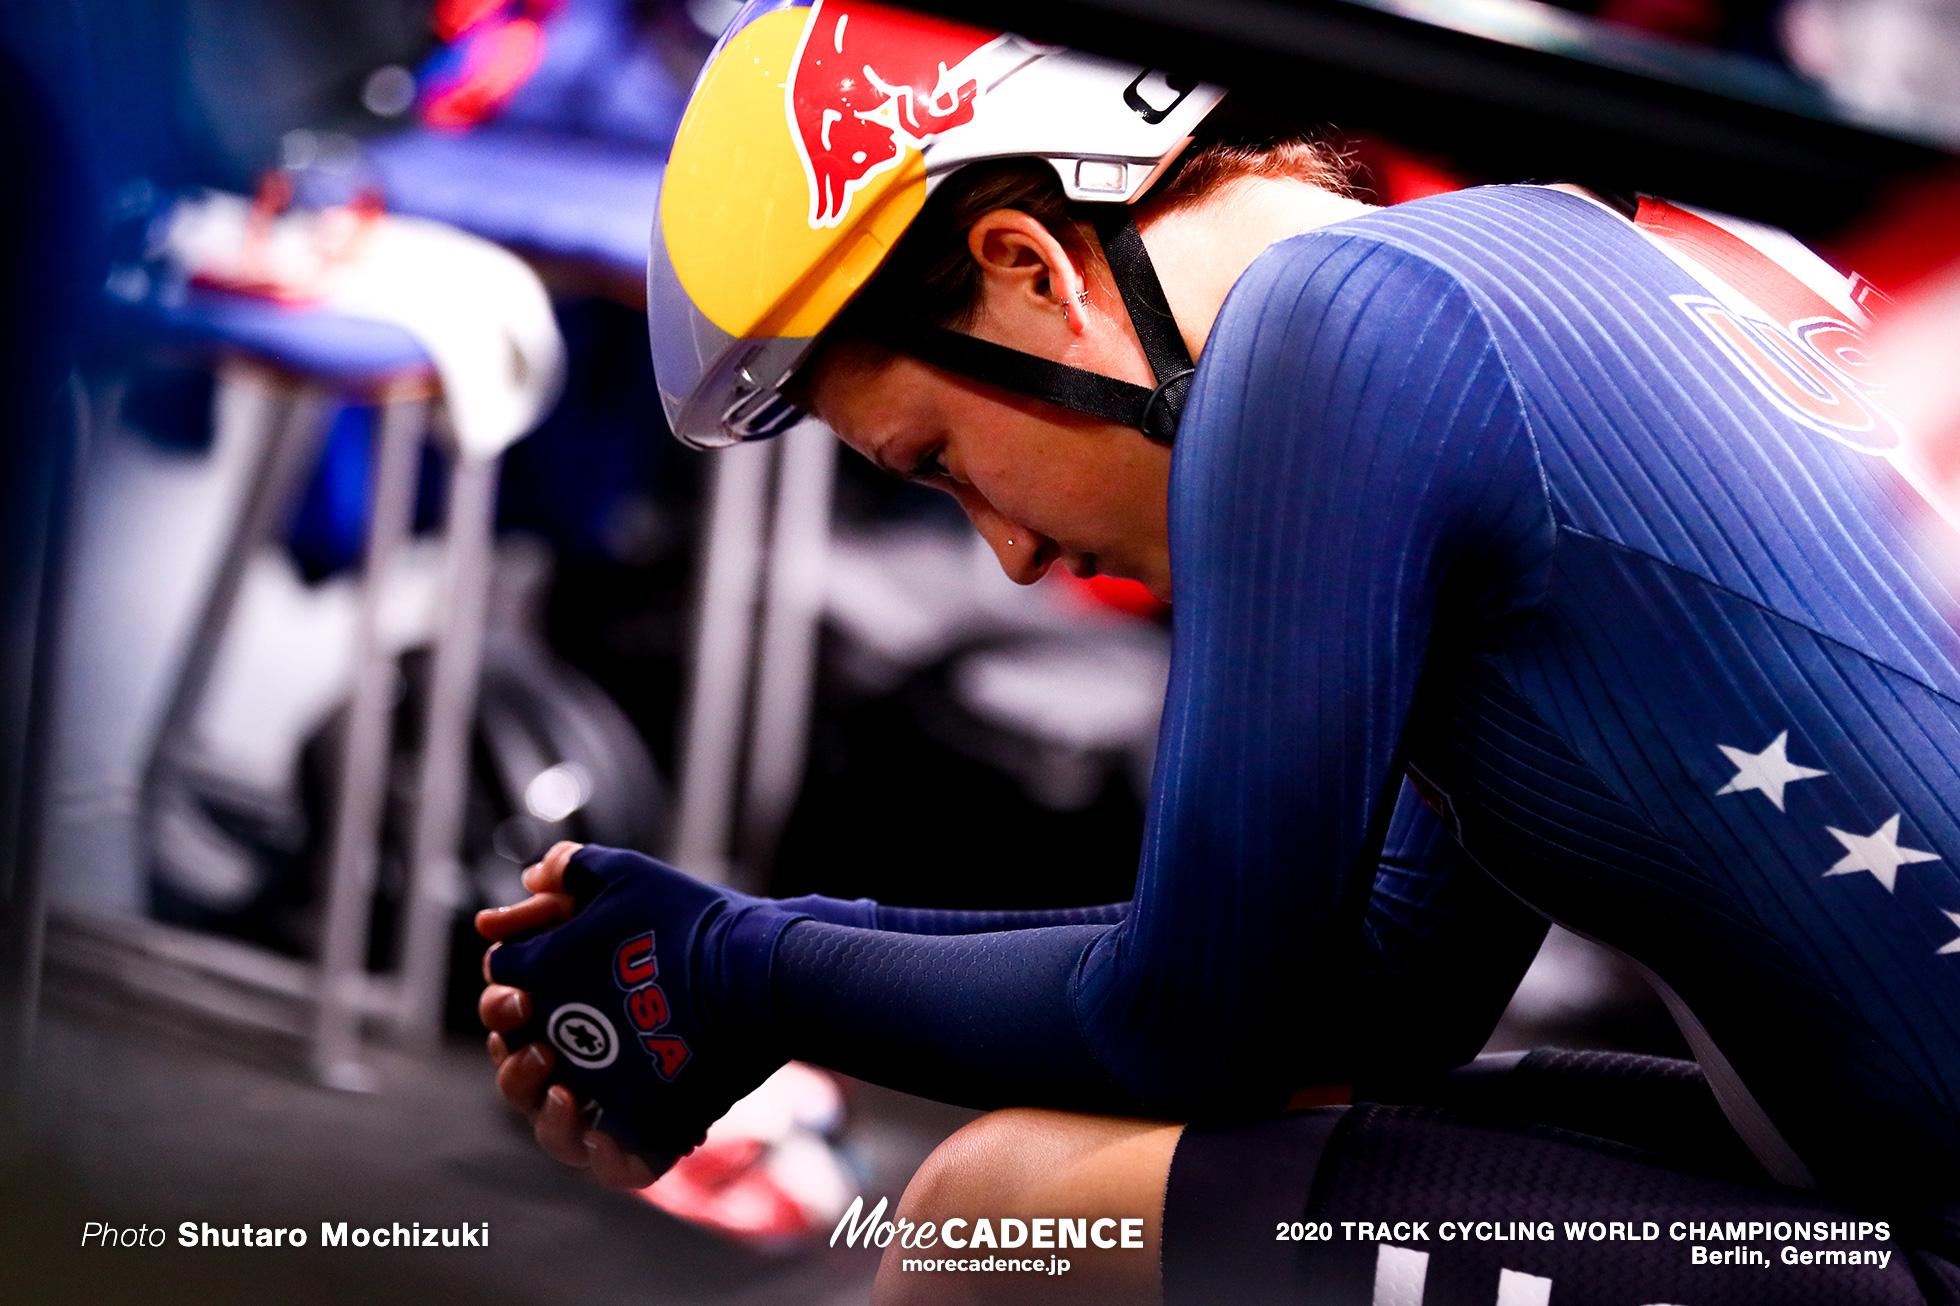 2020 Track Cycling World Championships, Chloe Dygert クロエ・ダイガート